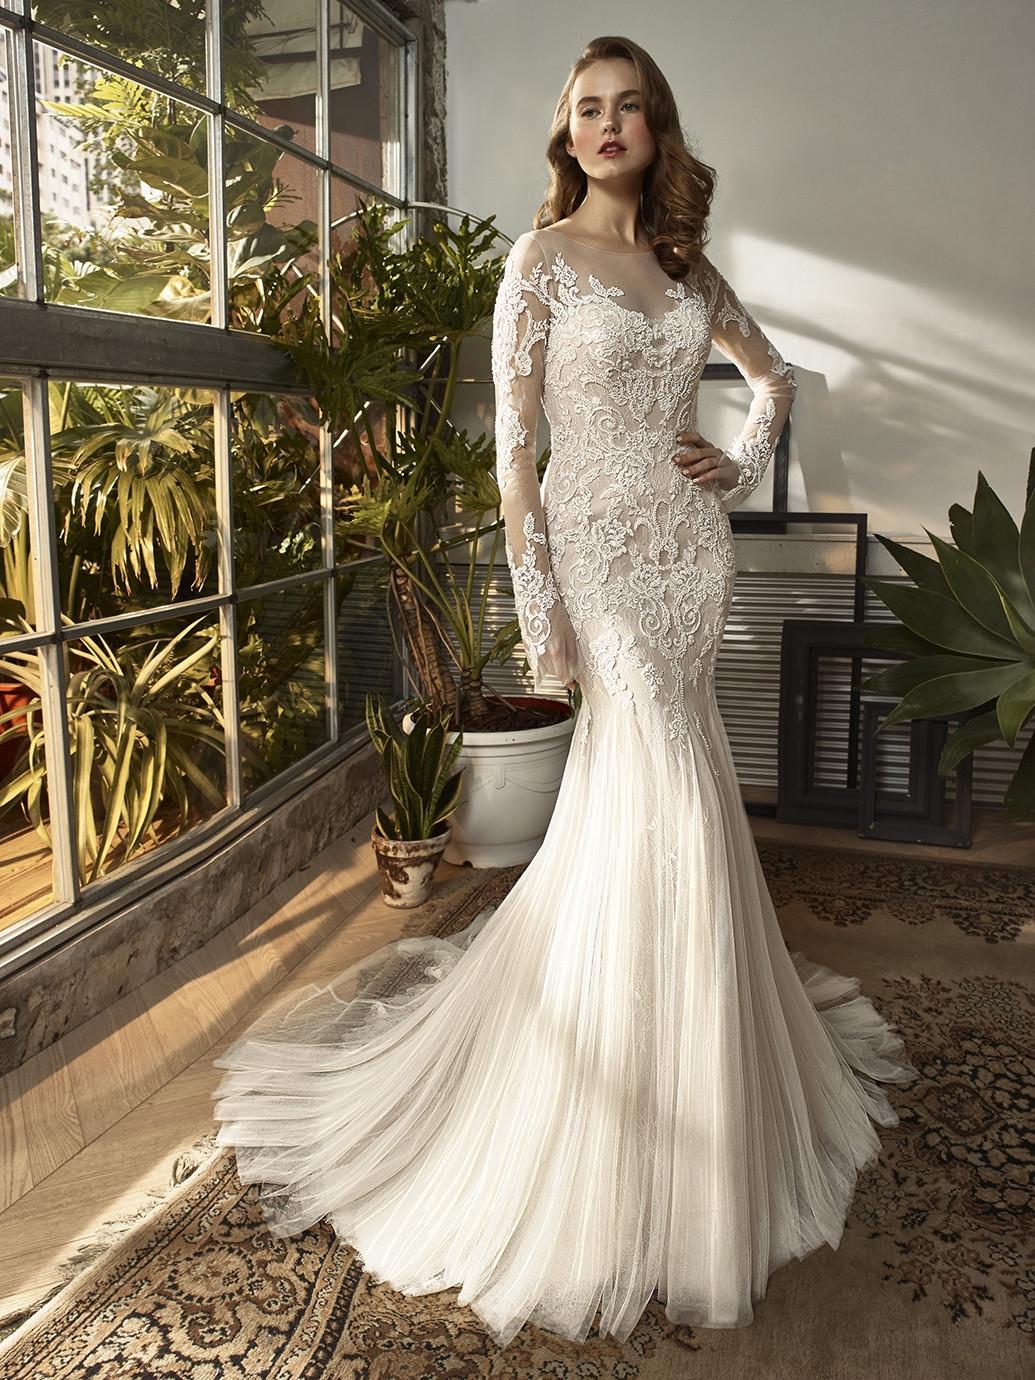 BT18-8 Mermaid Wedding Dress by Beautiful